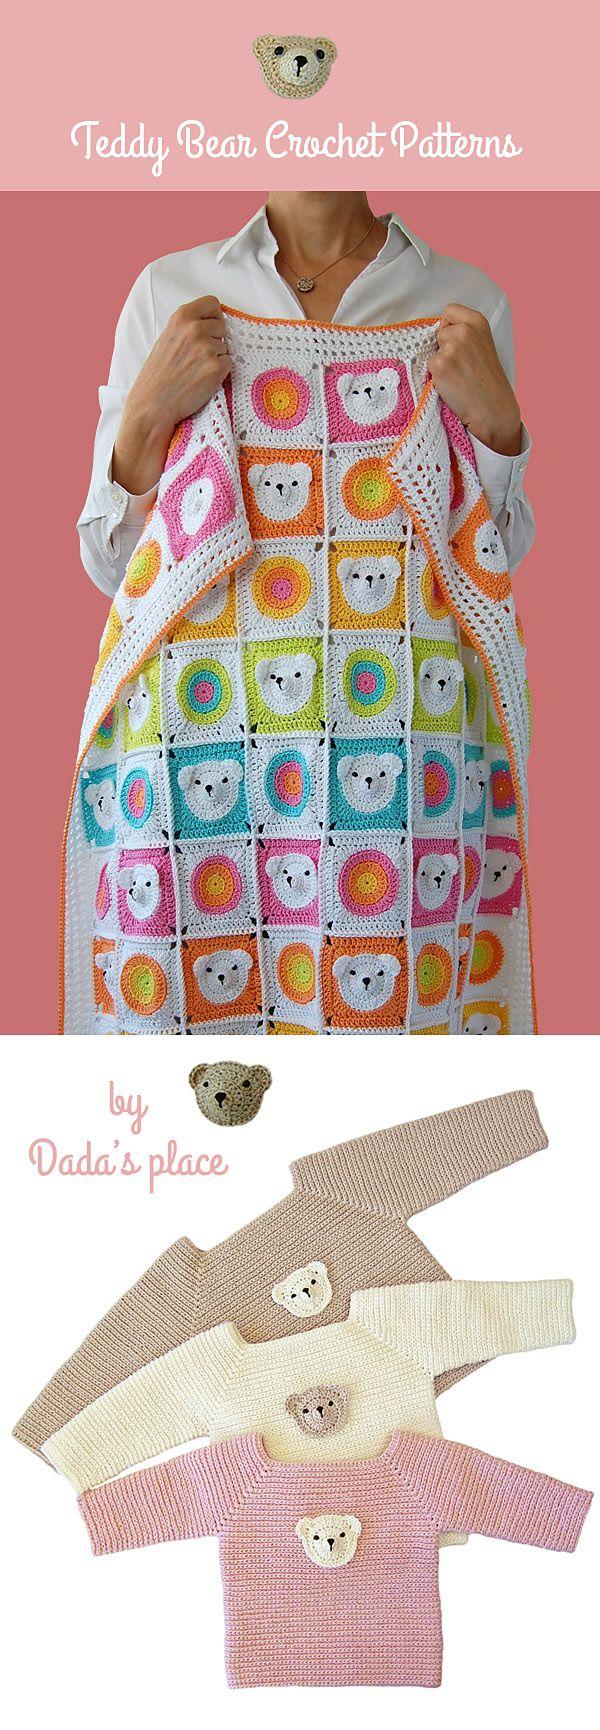 Teddy Bear Crochet Patterns by Dada's place